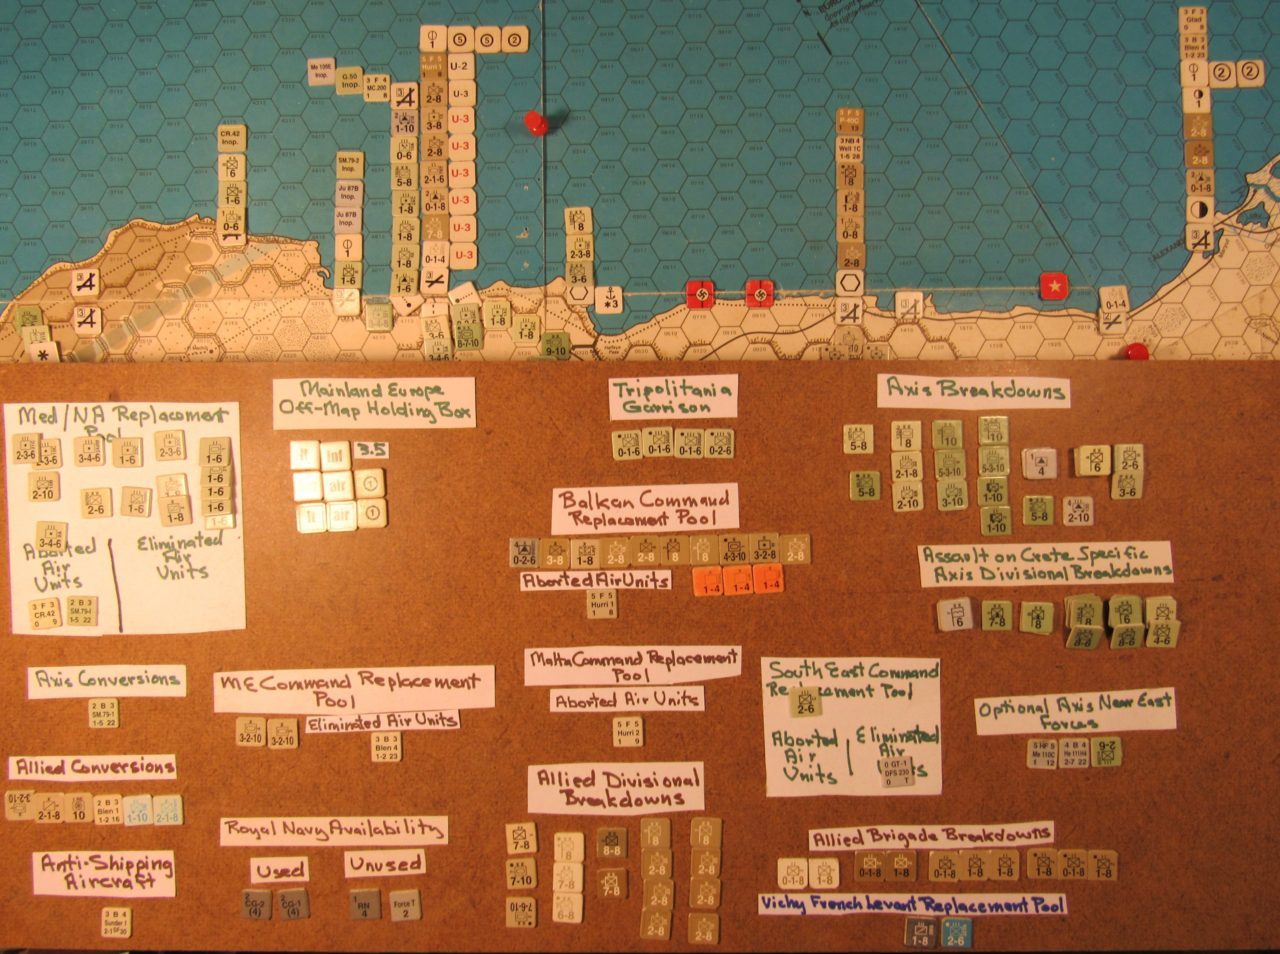 Jun I 41 Axis EOT dispositions: off-map display details